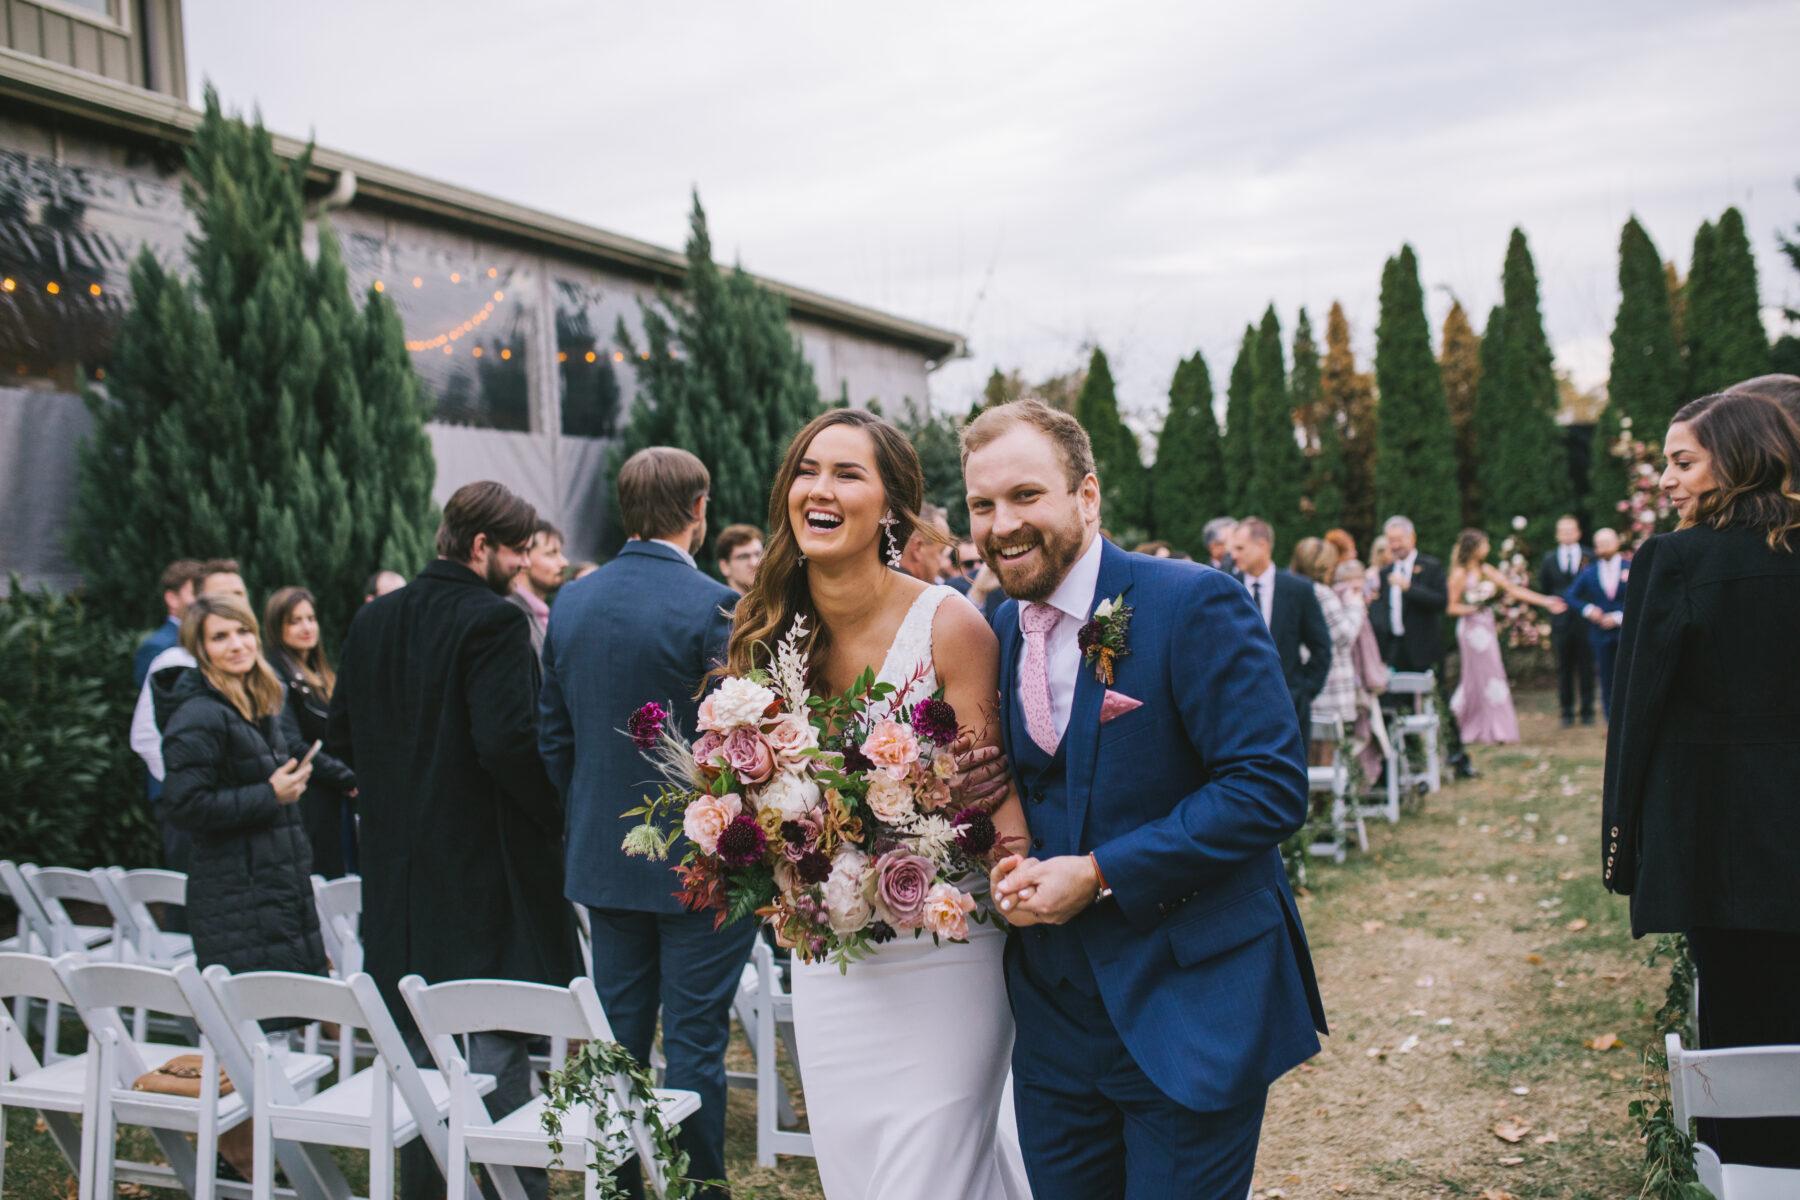 Outdoor Wedding Ceremony at The Cordelle | Nashville Bride Guide